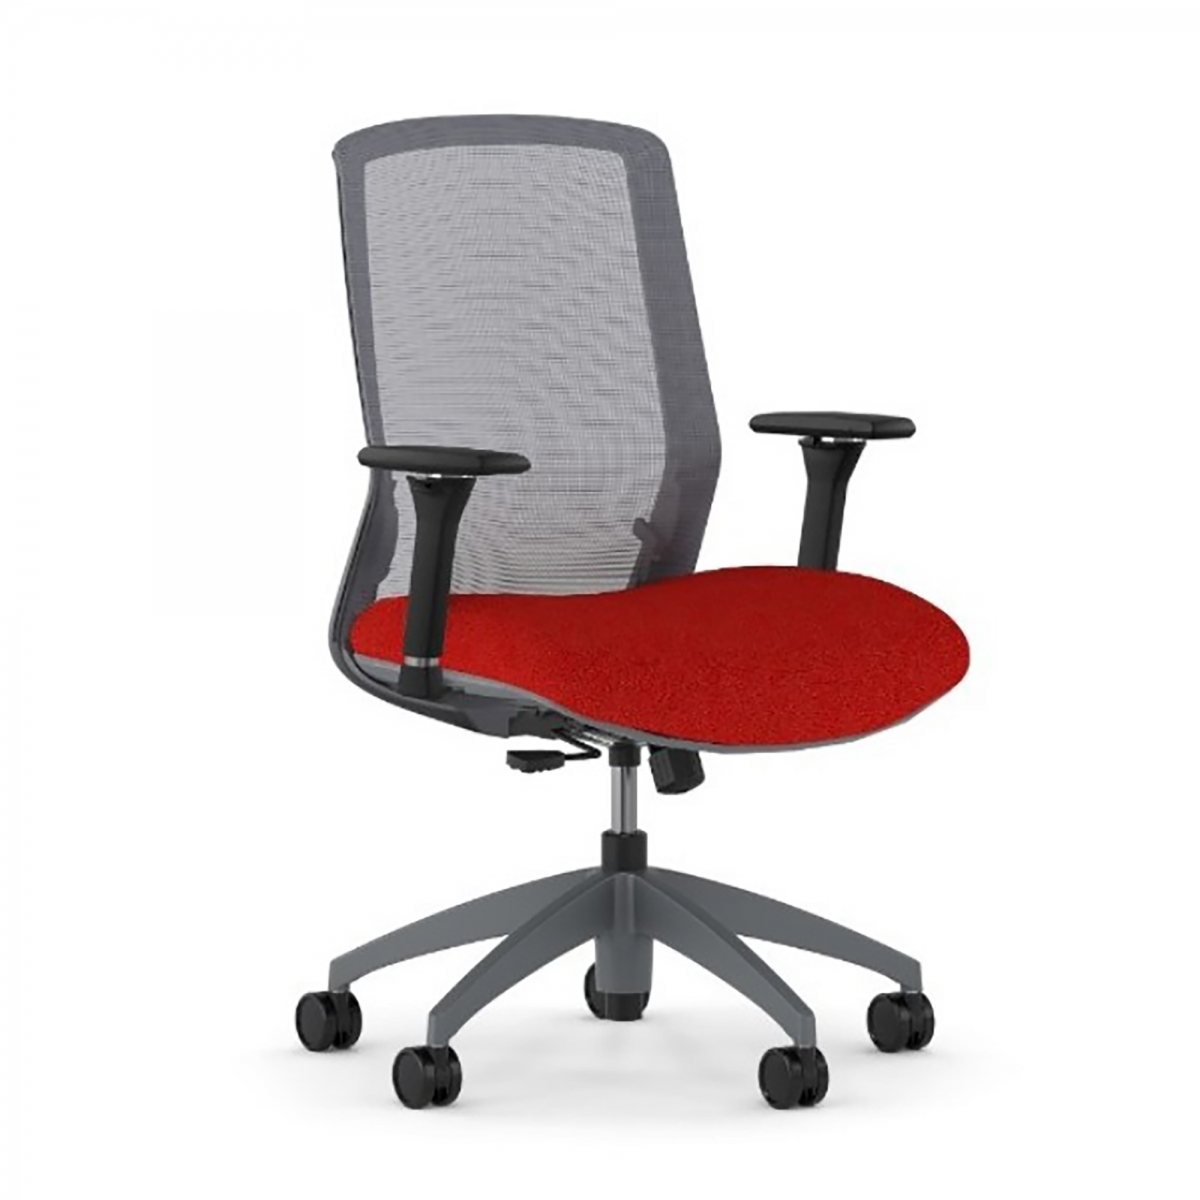 Neo Ergonomic Office Chair